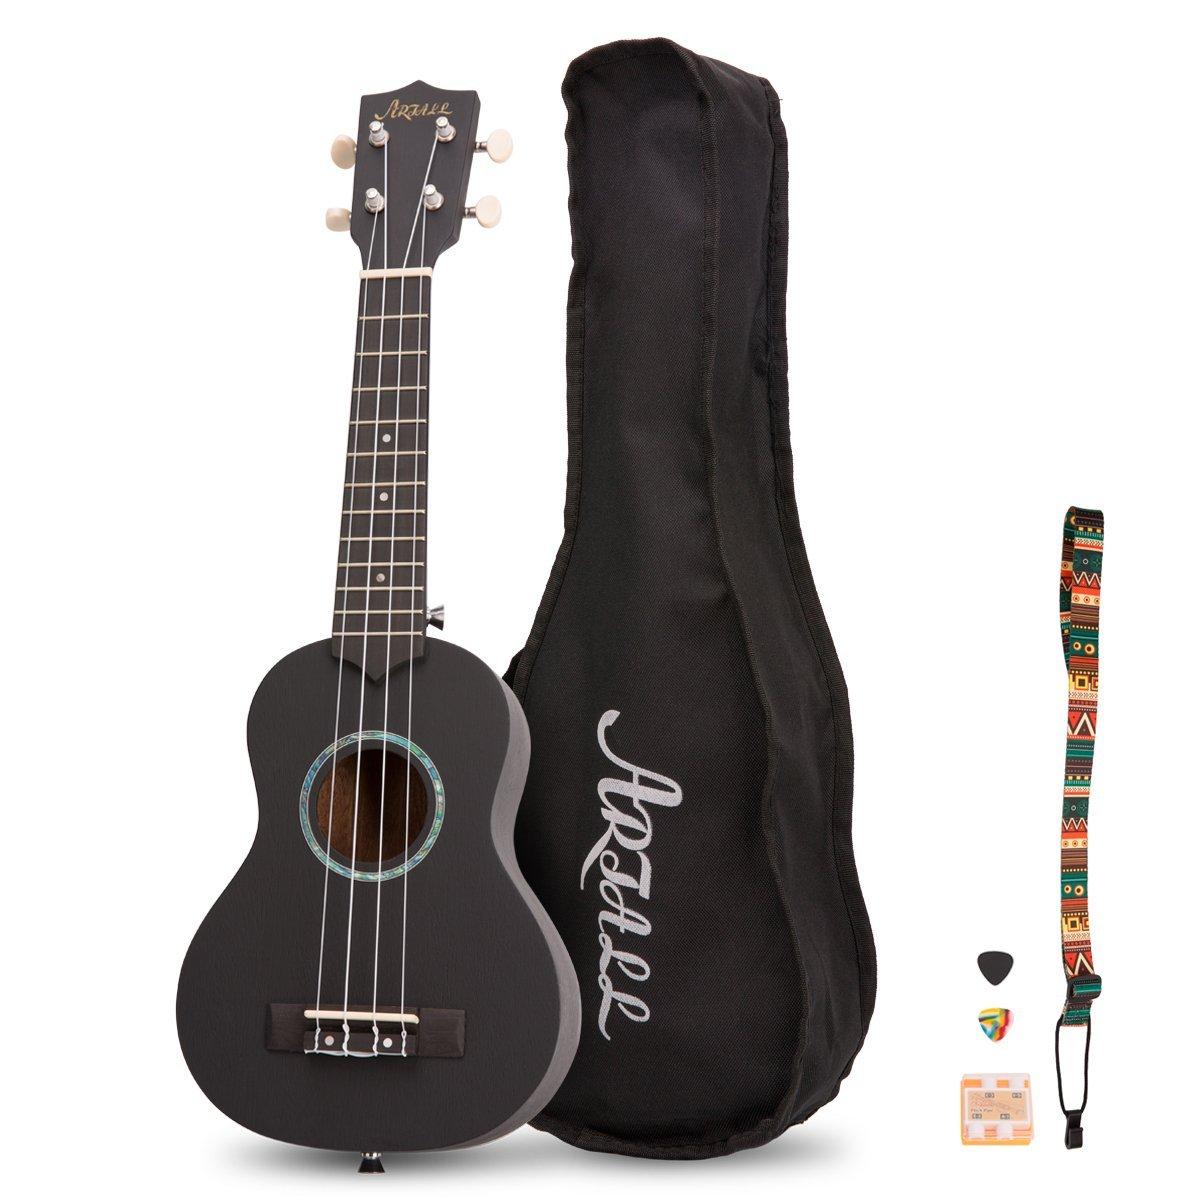 Wood Soprano Ukulele Sapele Guitar 21 inch with Accessories  $24.14 AC